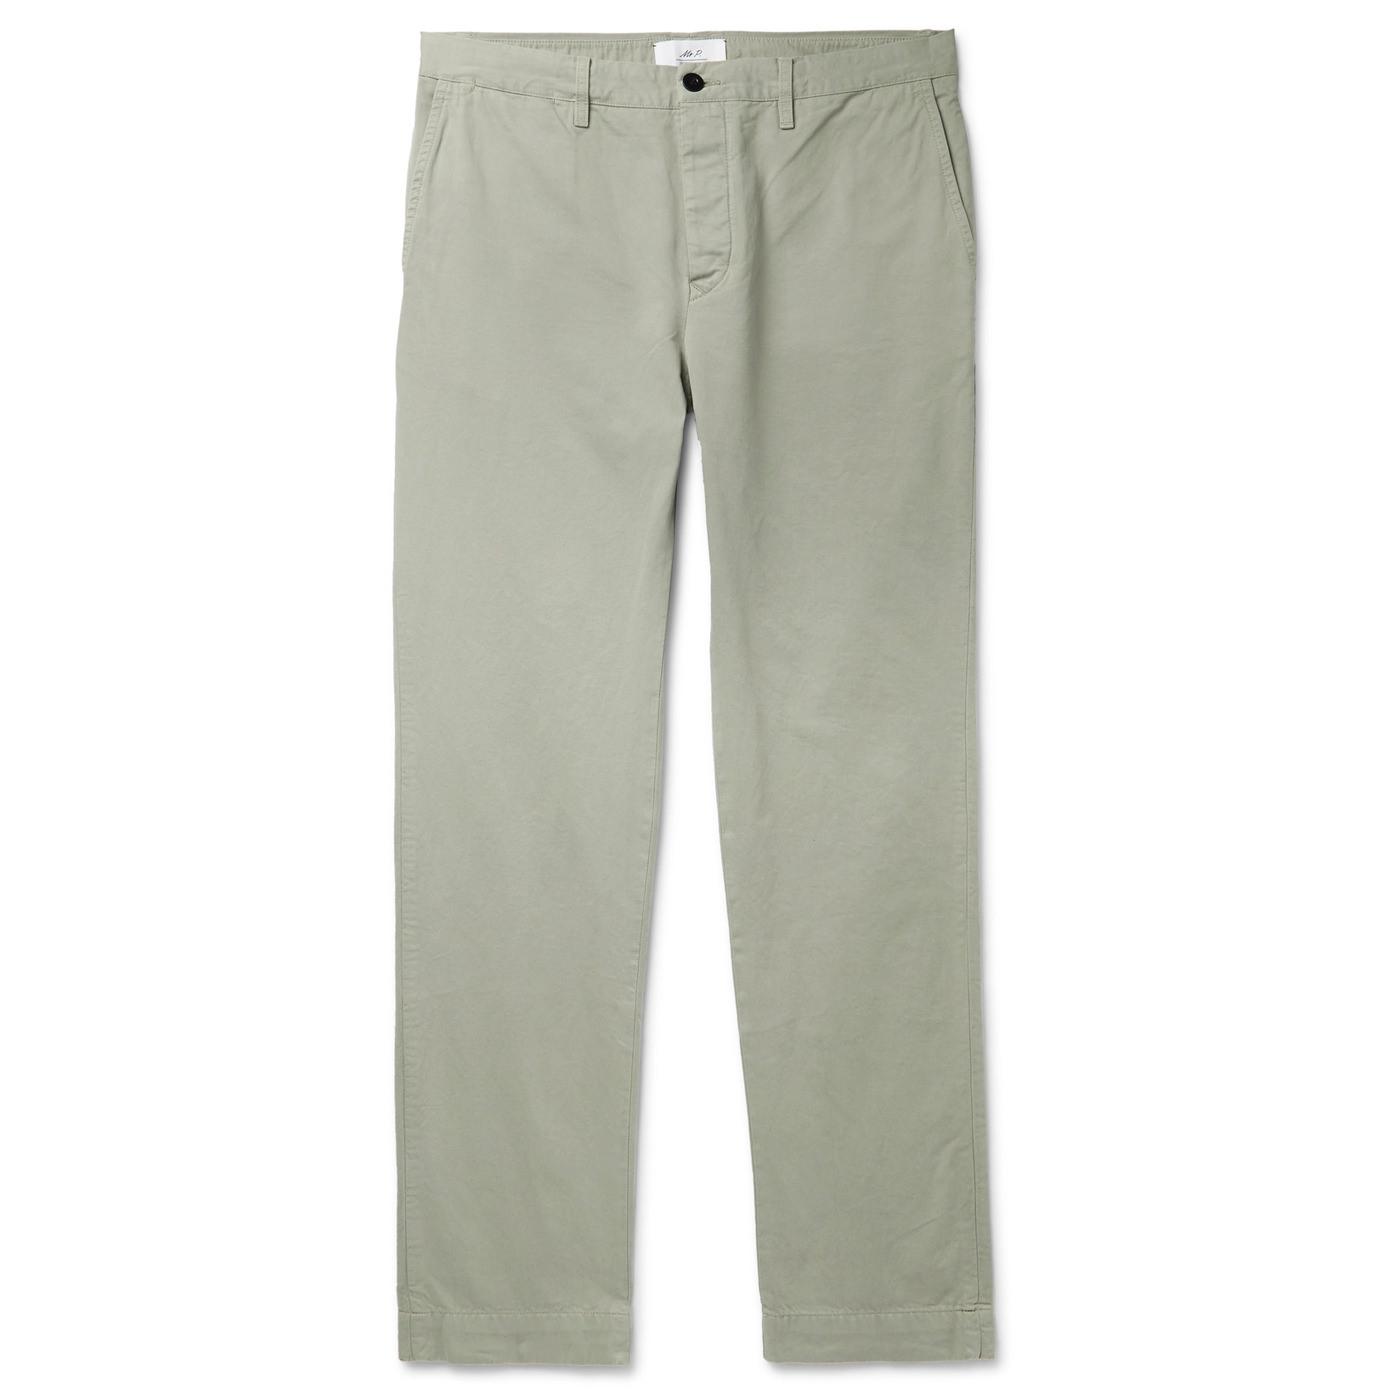 Style Mr Porter Pantalon Mr P. Chinos